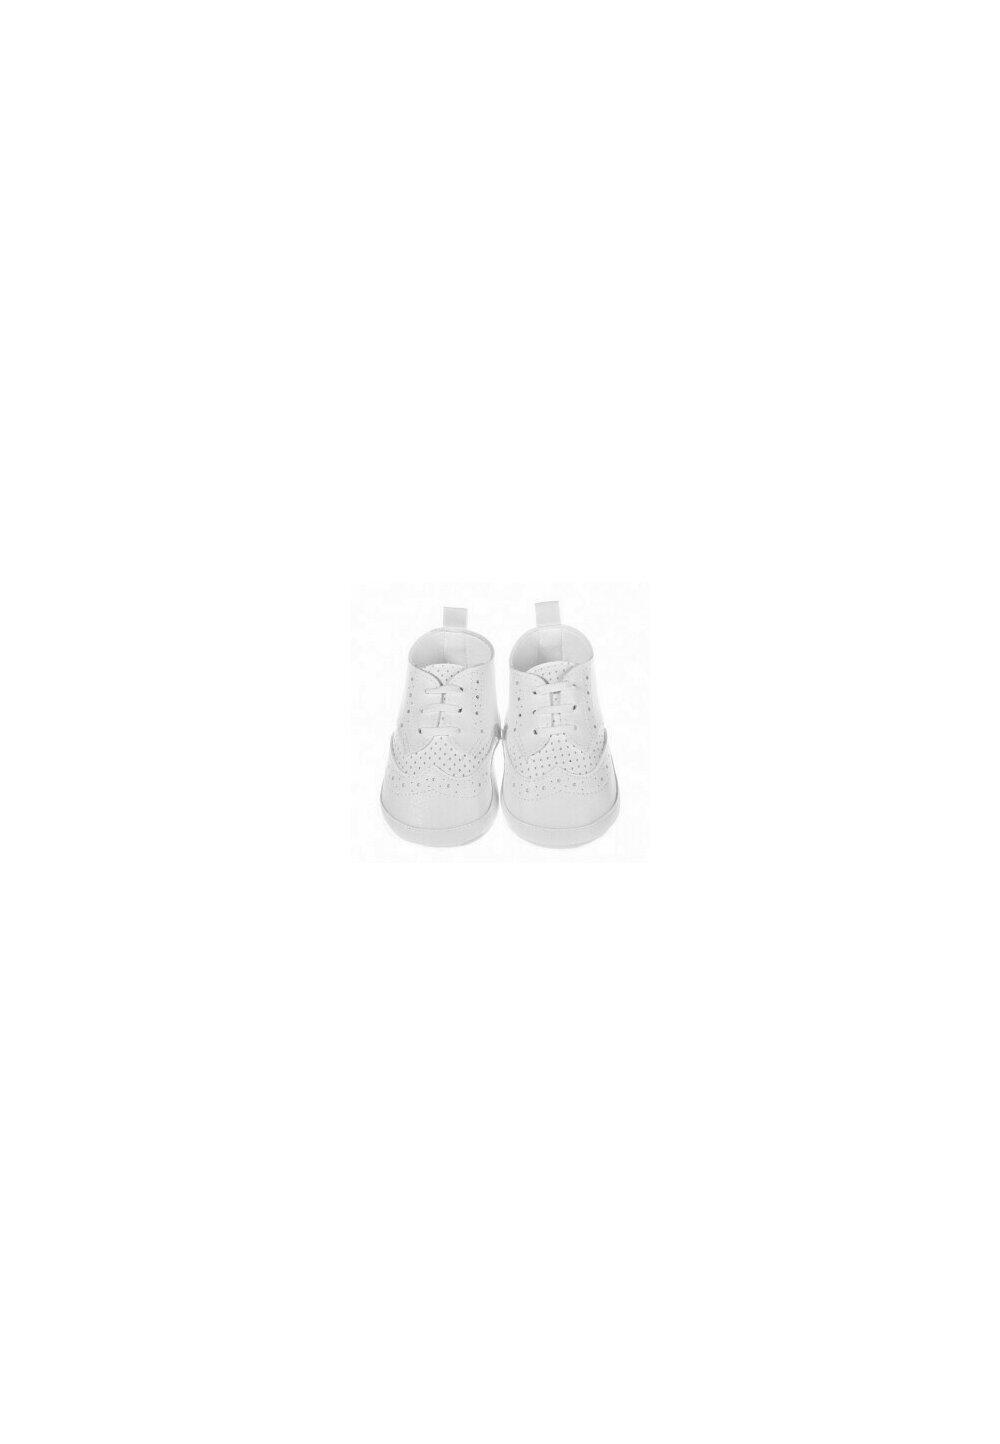 Papucei bebe, botez,albi imagine